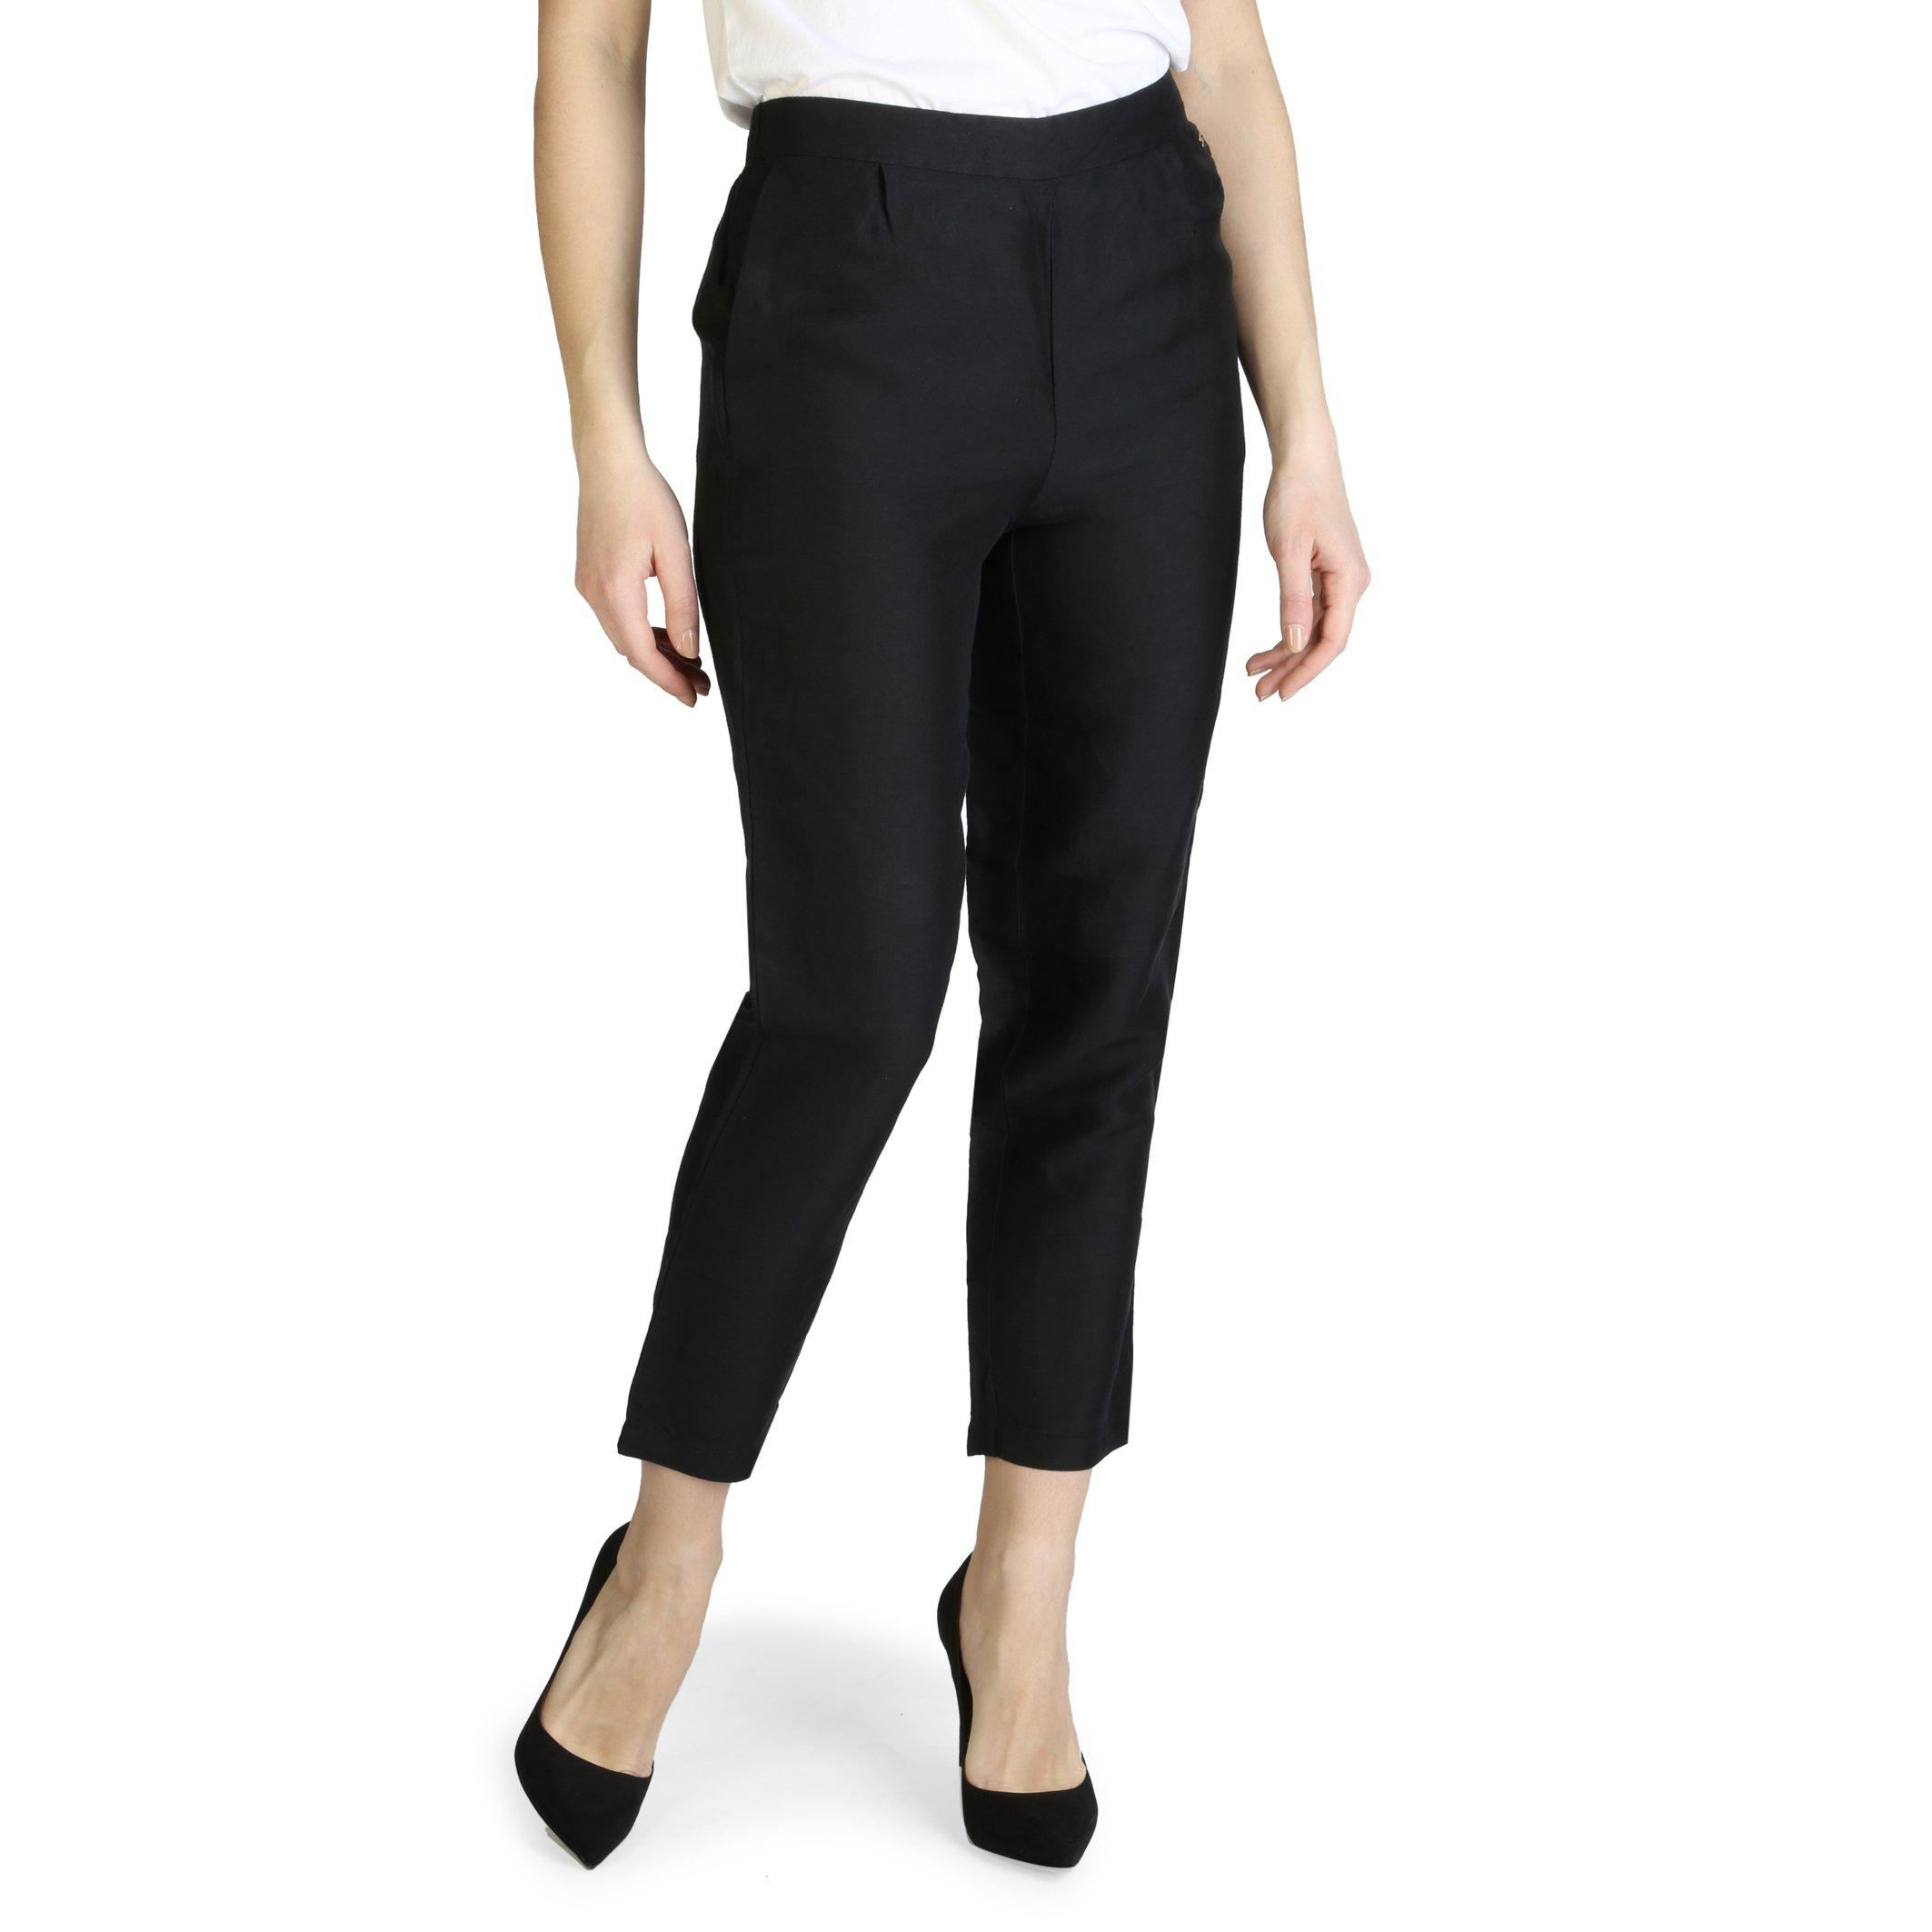 Armani Exchange Women's Trouser Various Colours 3ZYP19_YNBBZ - black-1 12